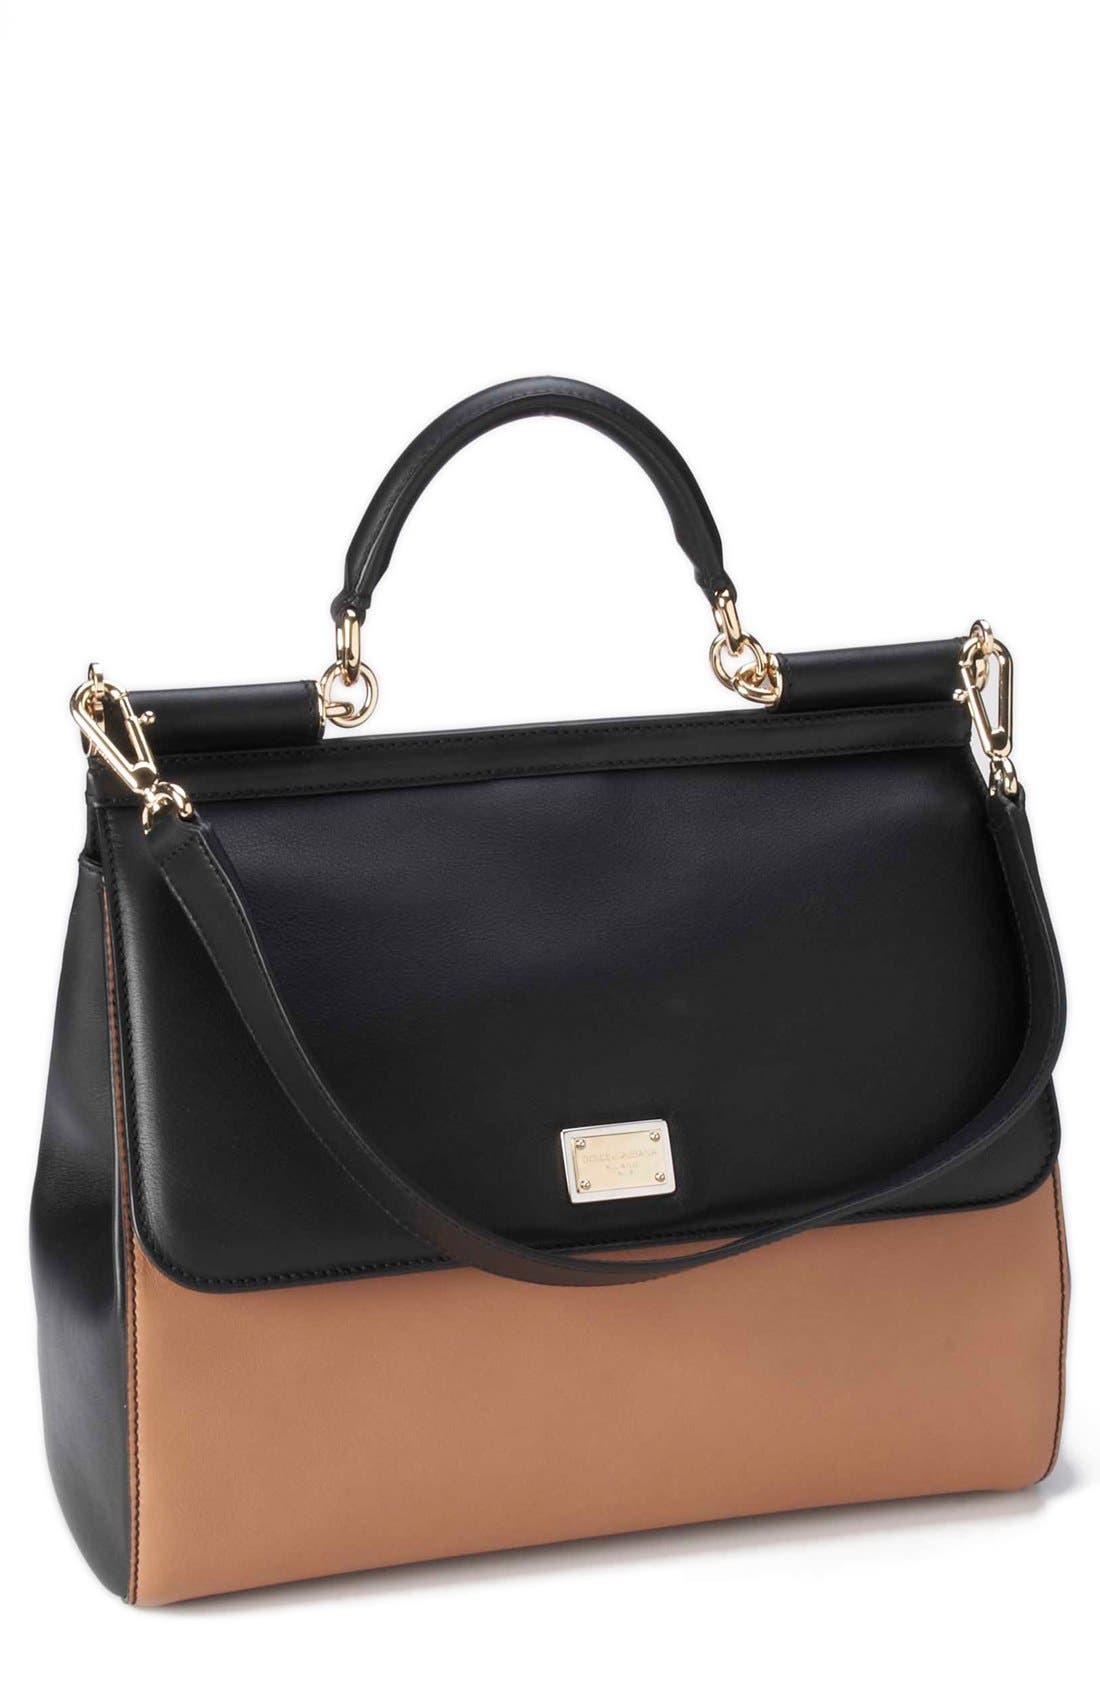 Main Image - Dolce&Gabbana 'Miss Sicily - Bi-Color' Top Handle Leather Satchel